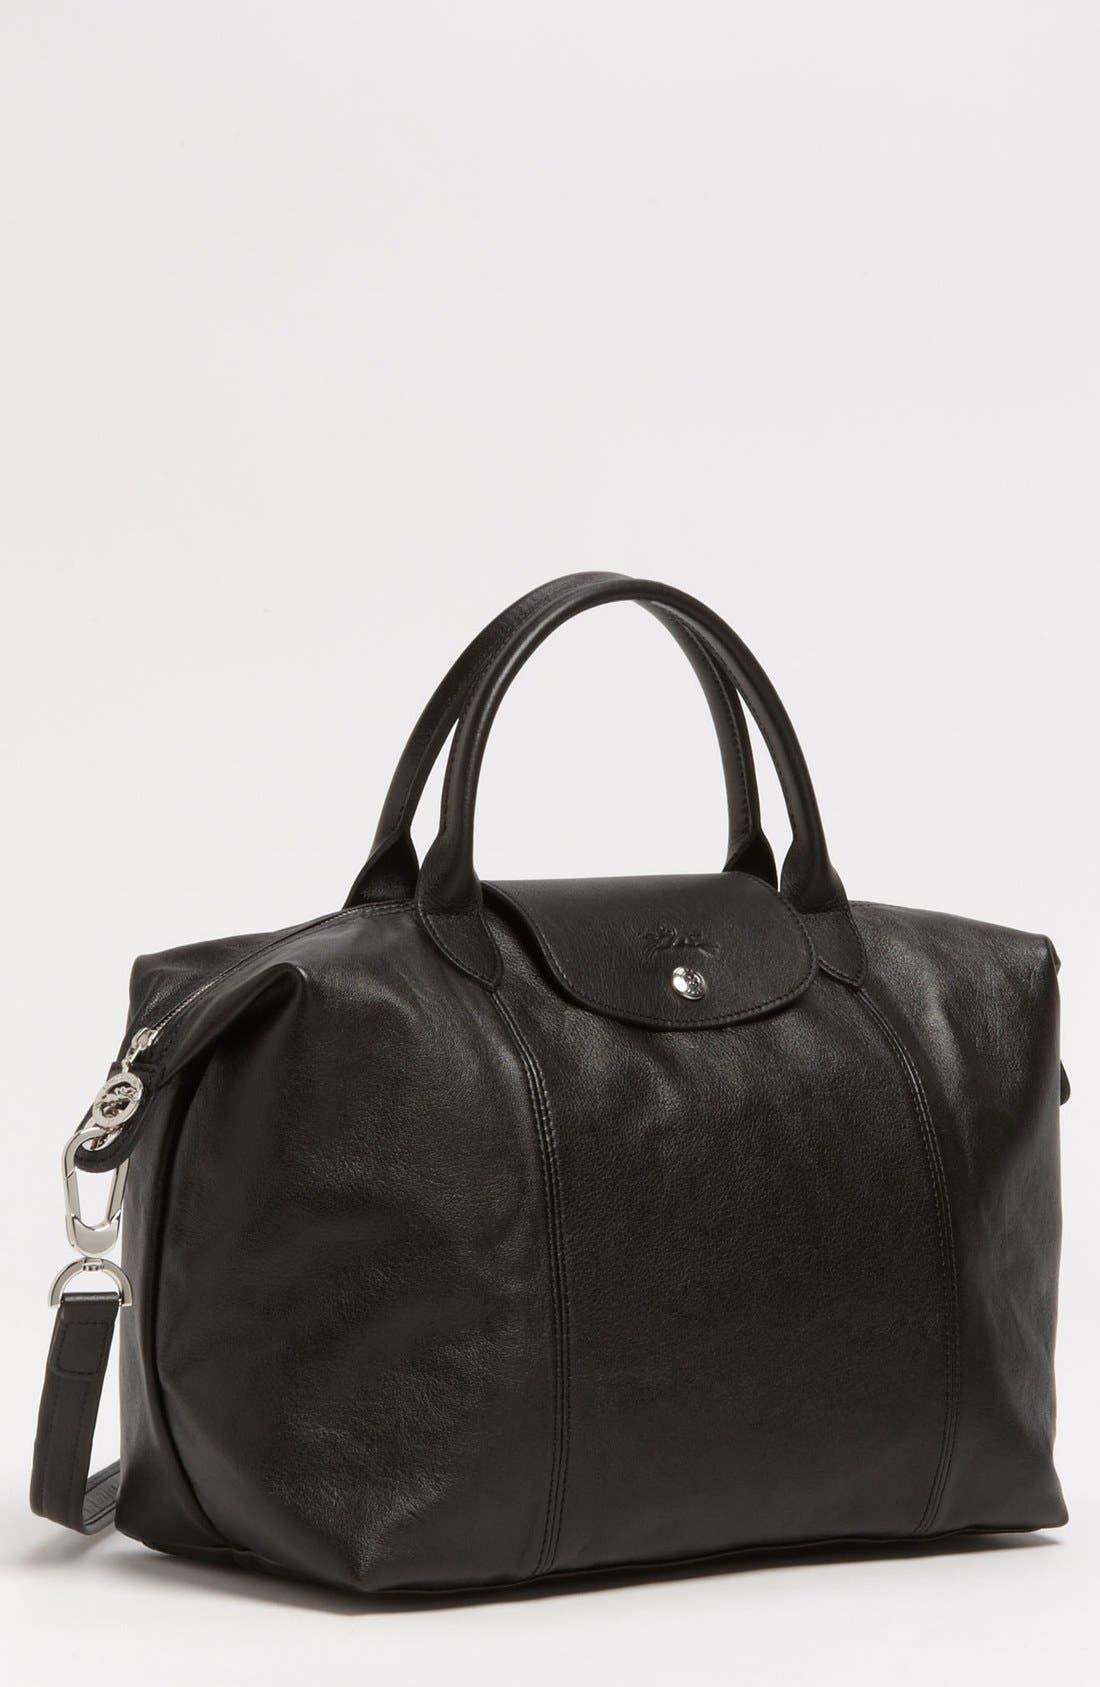 Longchamp medium le pliage cuir leather top handle tote nordstrom jpg  780x838 Pliage cuir travel longchamp d2a8af4f05017